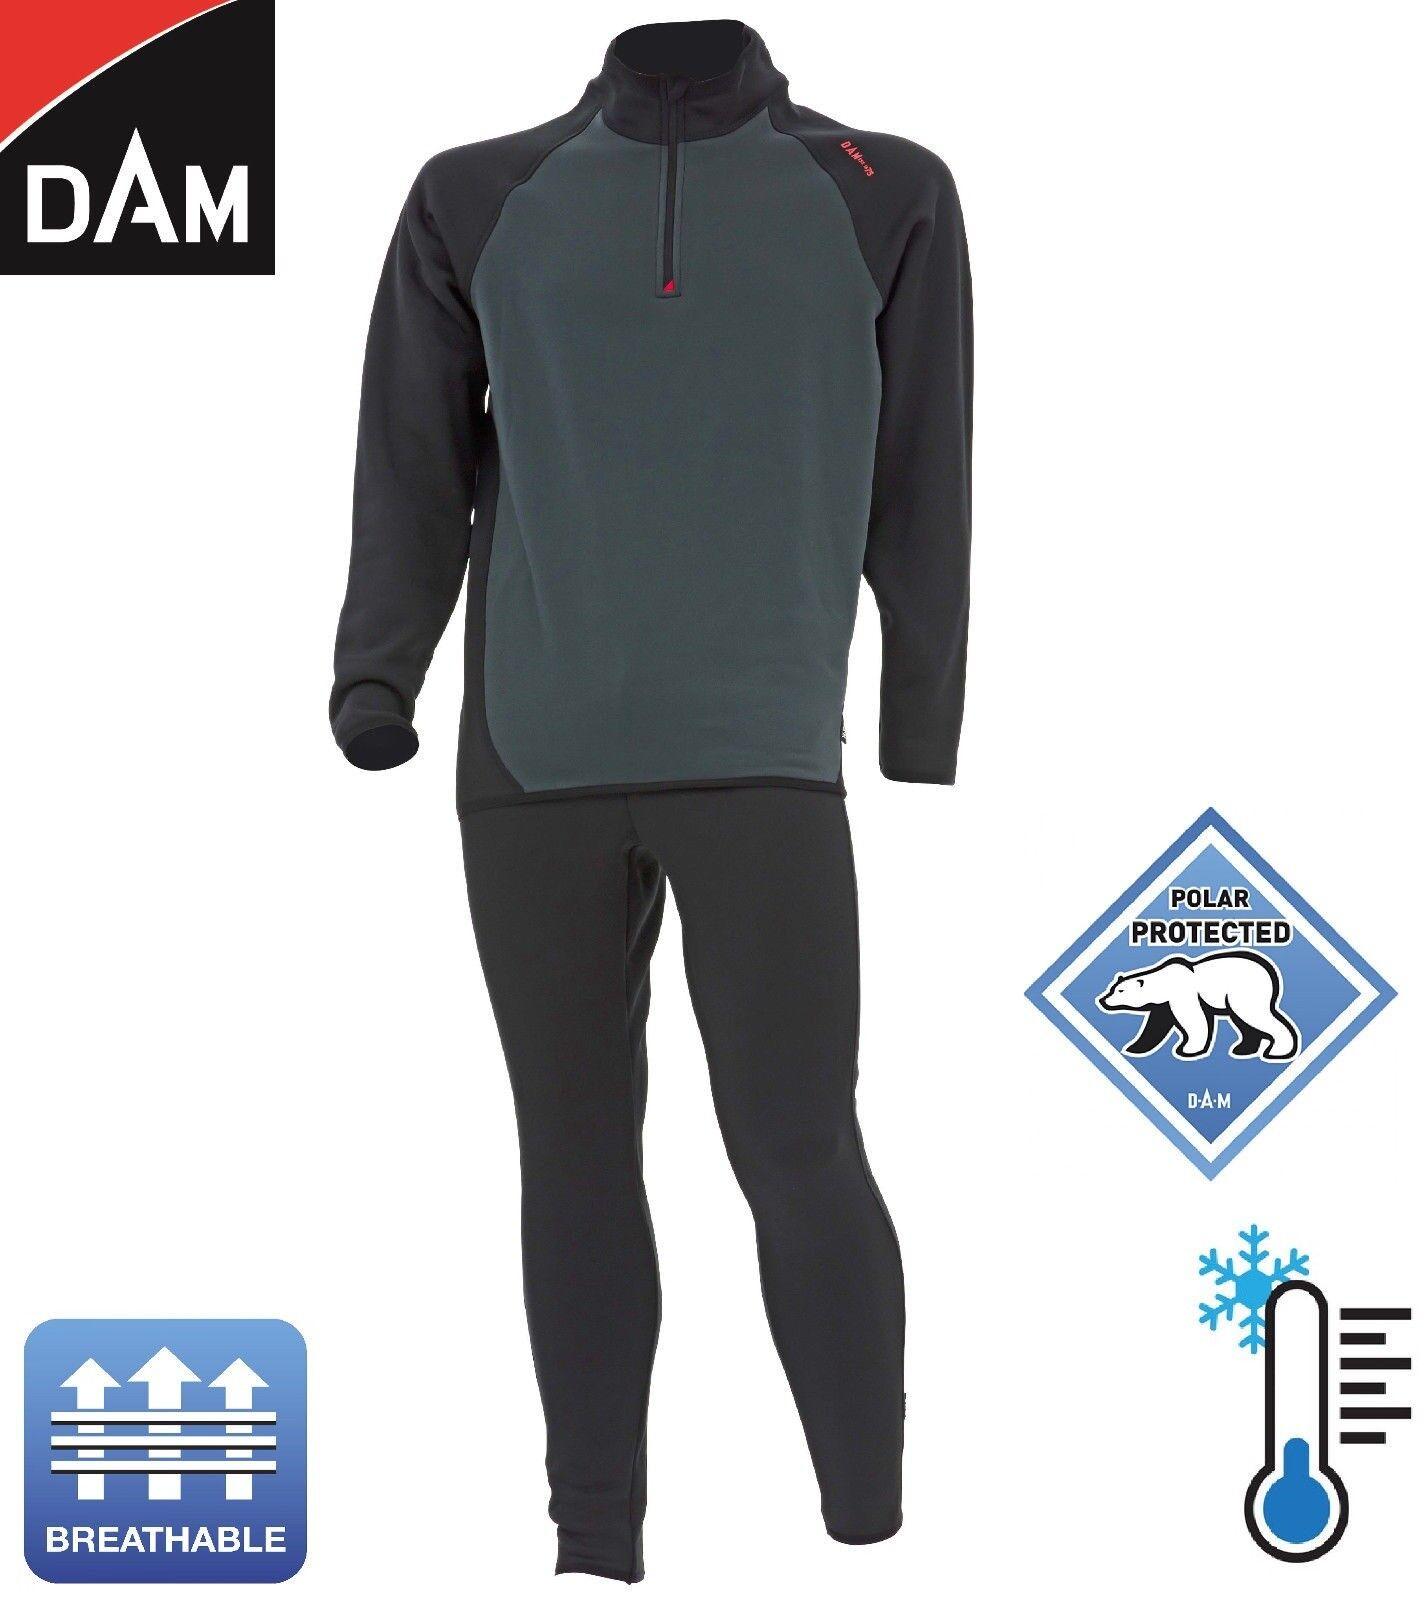 DAM X-pedition Thermo Fleece Unterwäsche - Winter Anzug   Thermoanzug Outdoor